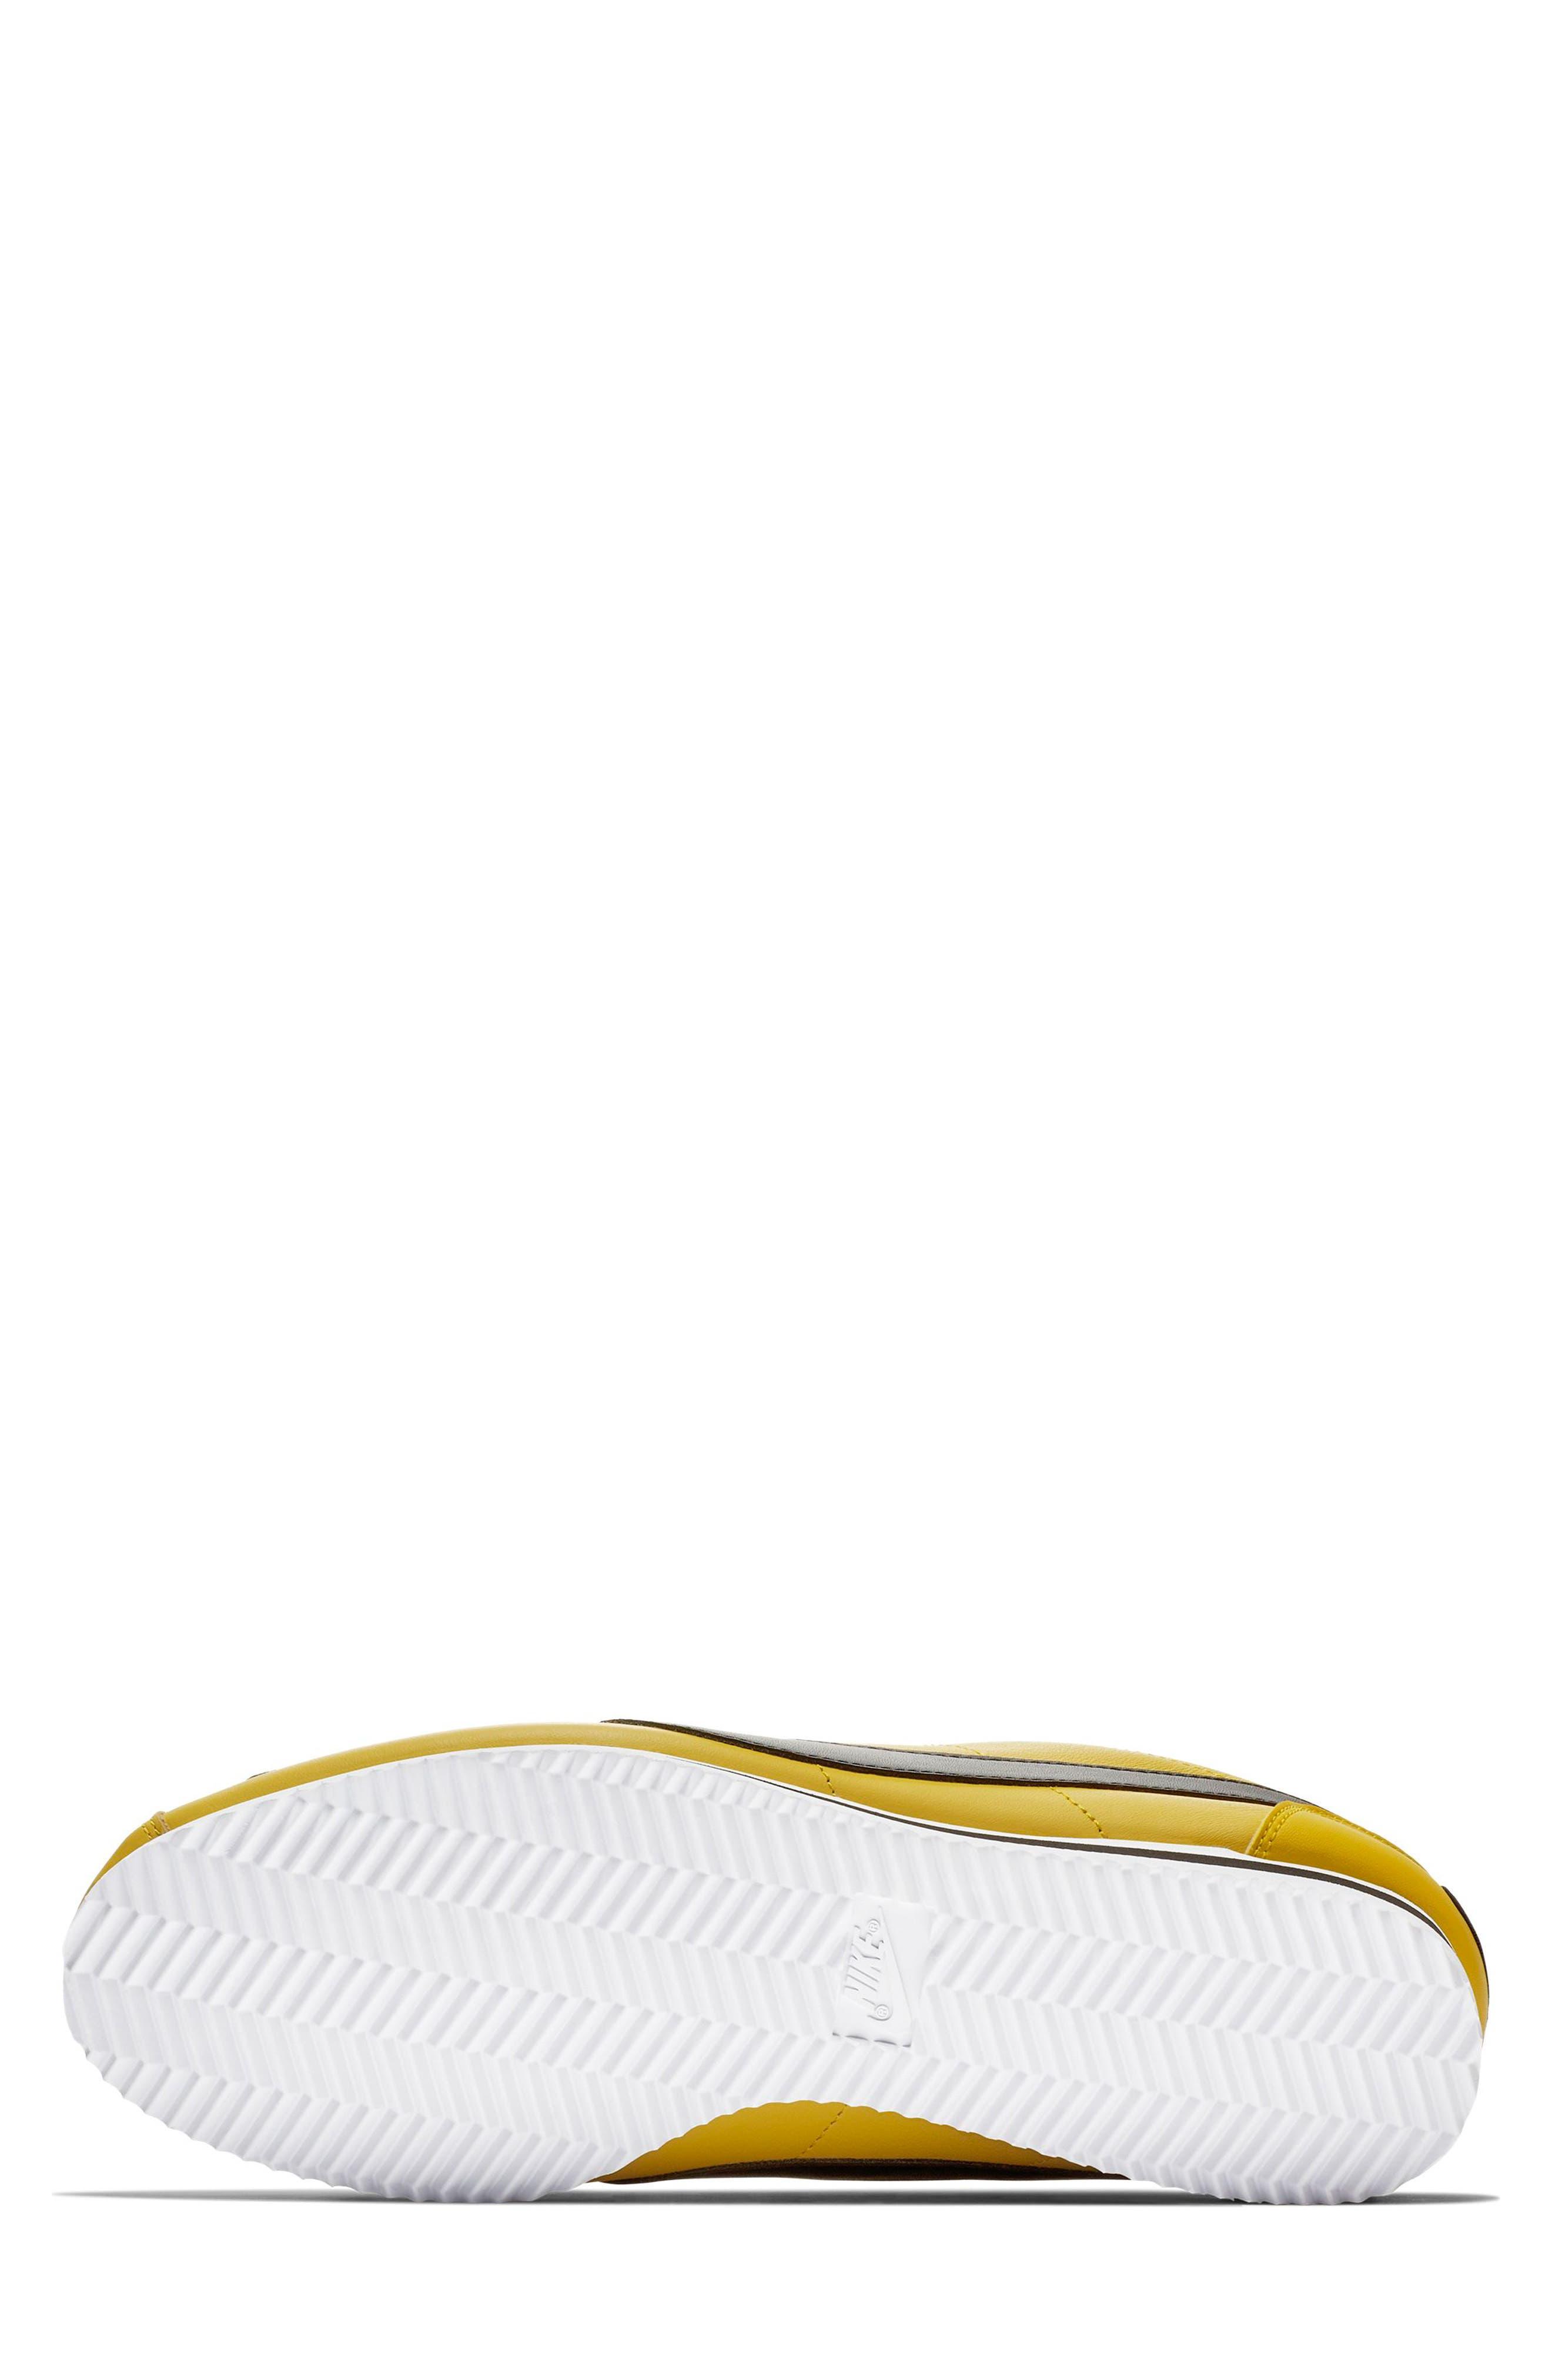 Classic Cortez Premium Sneaker,                             Alternate thumbnail 5, color,                             BRIGHT CITRON/ BLACK/ WHITE